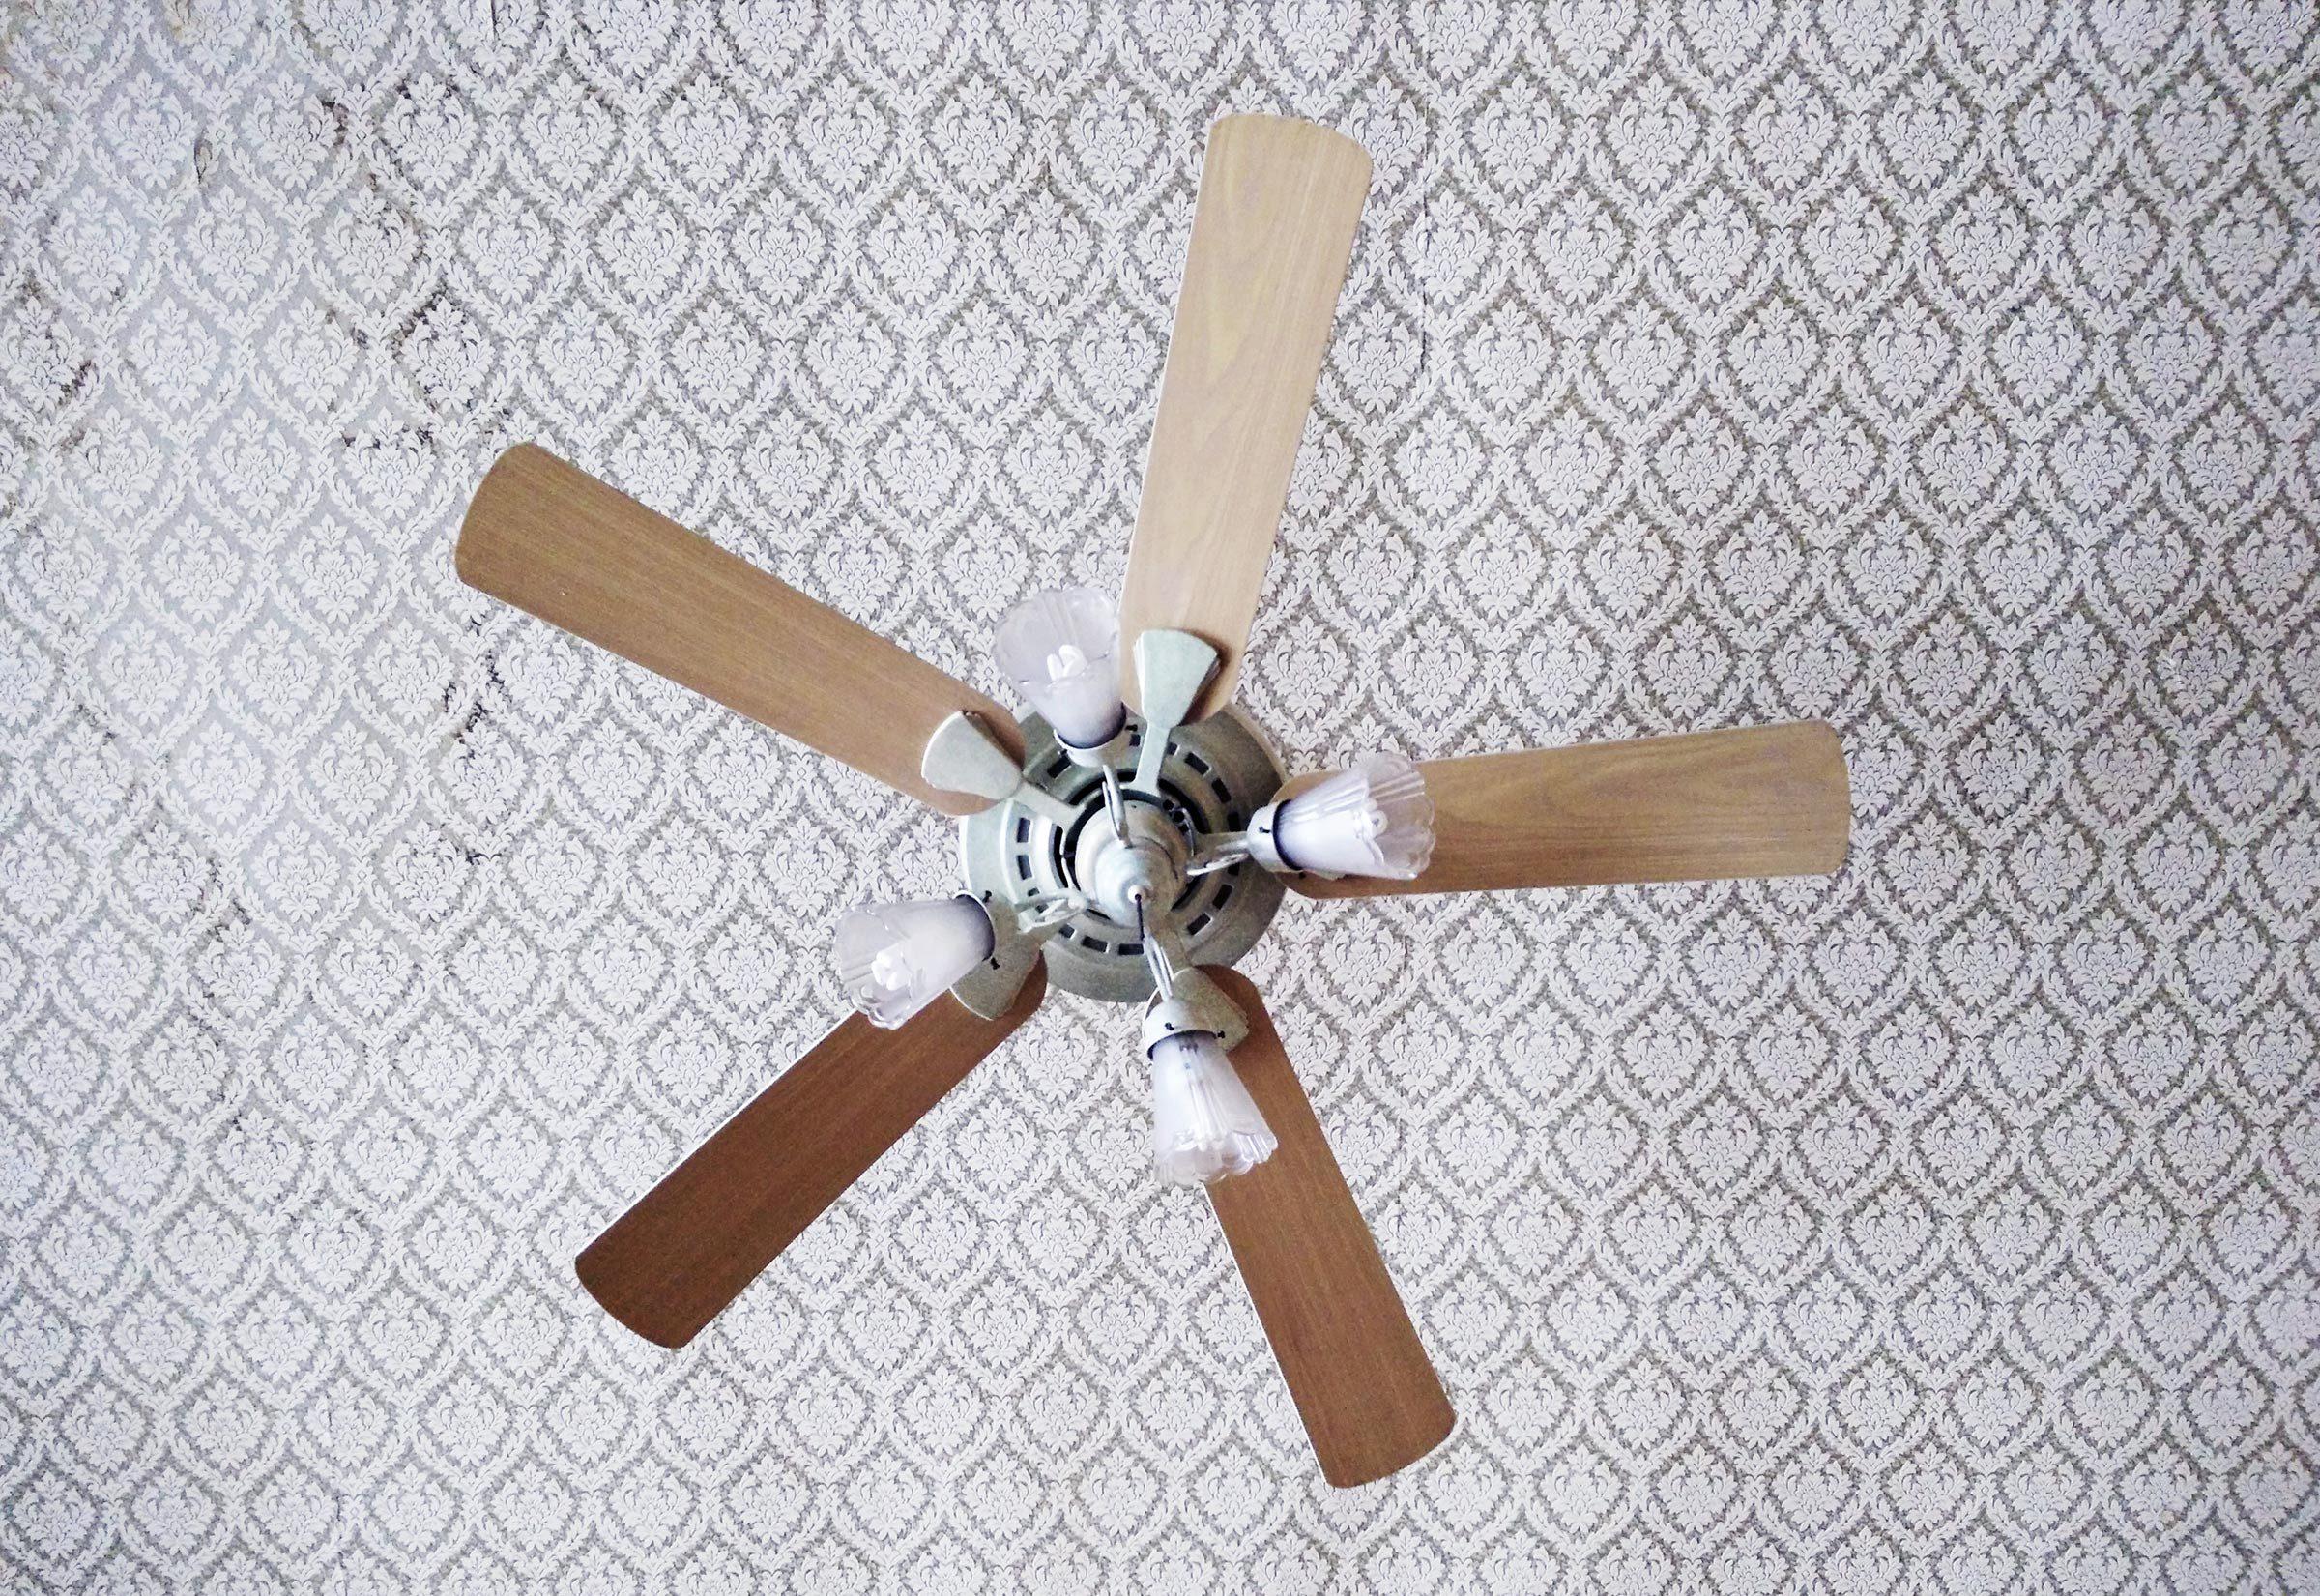 Clean ceiling fixtures